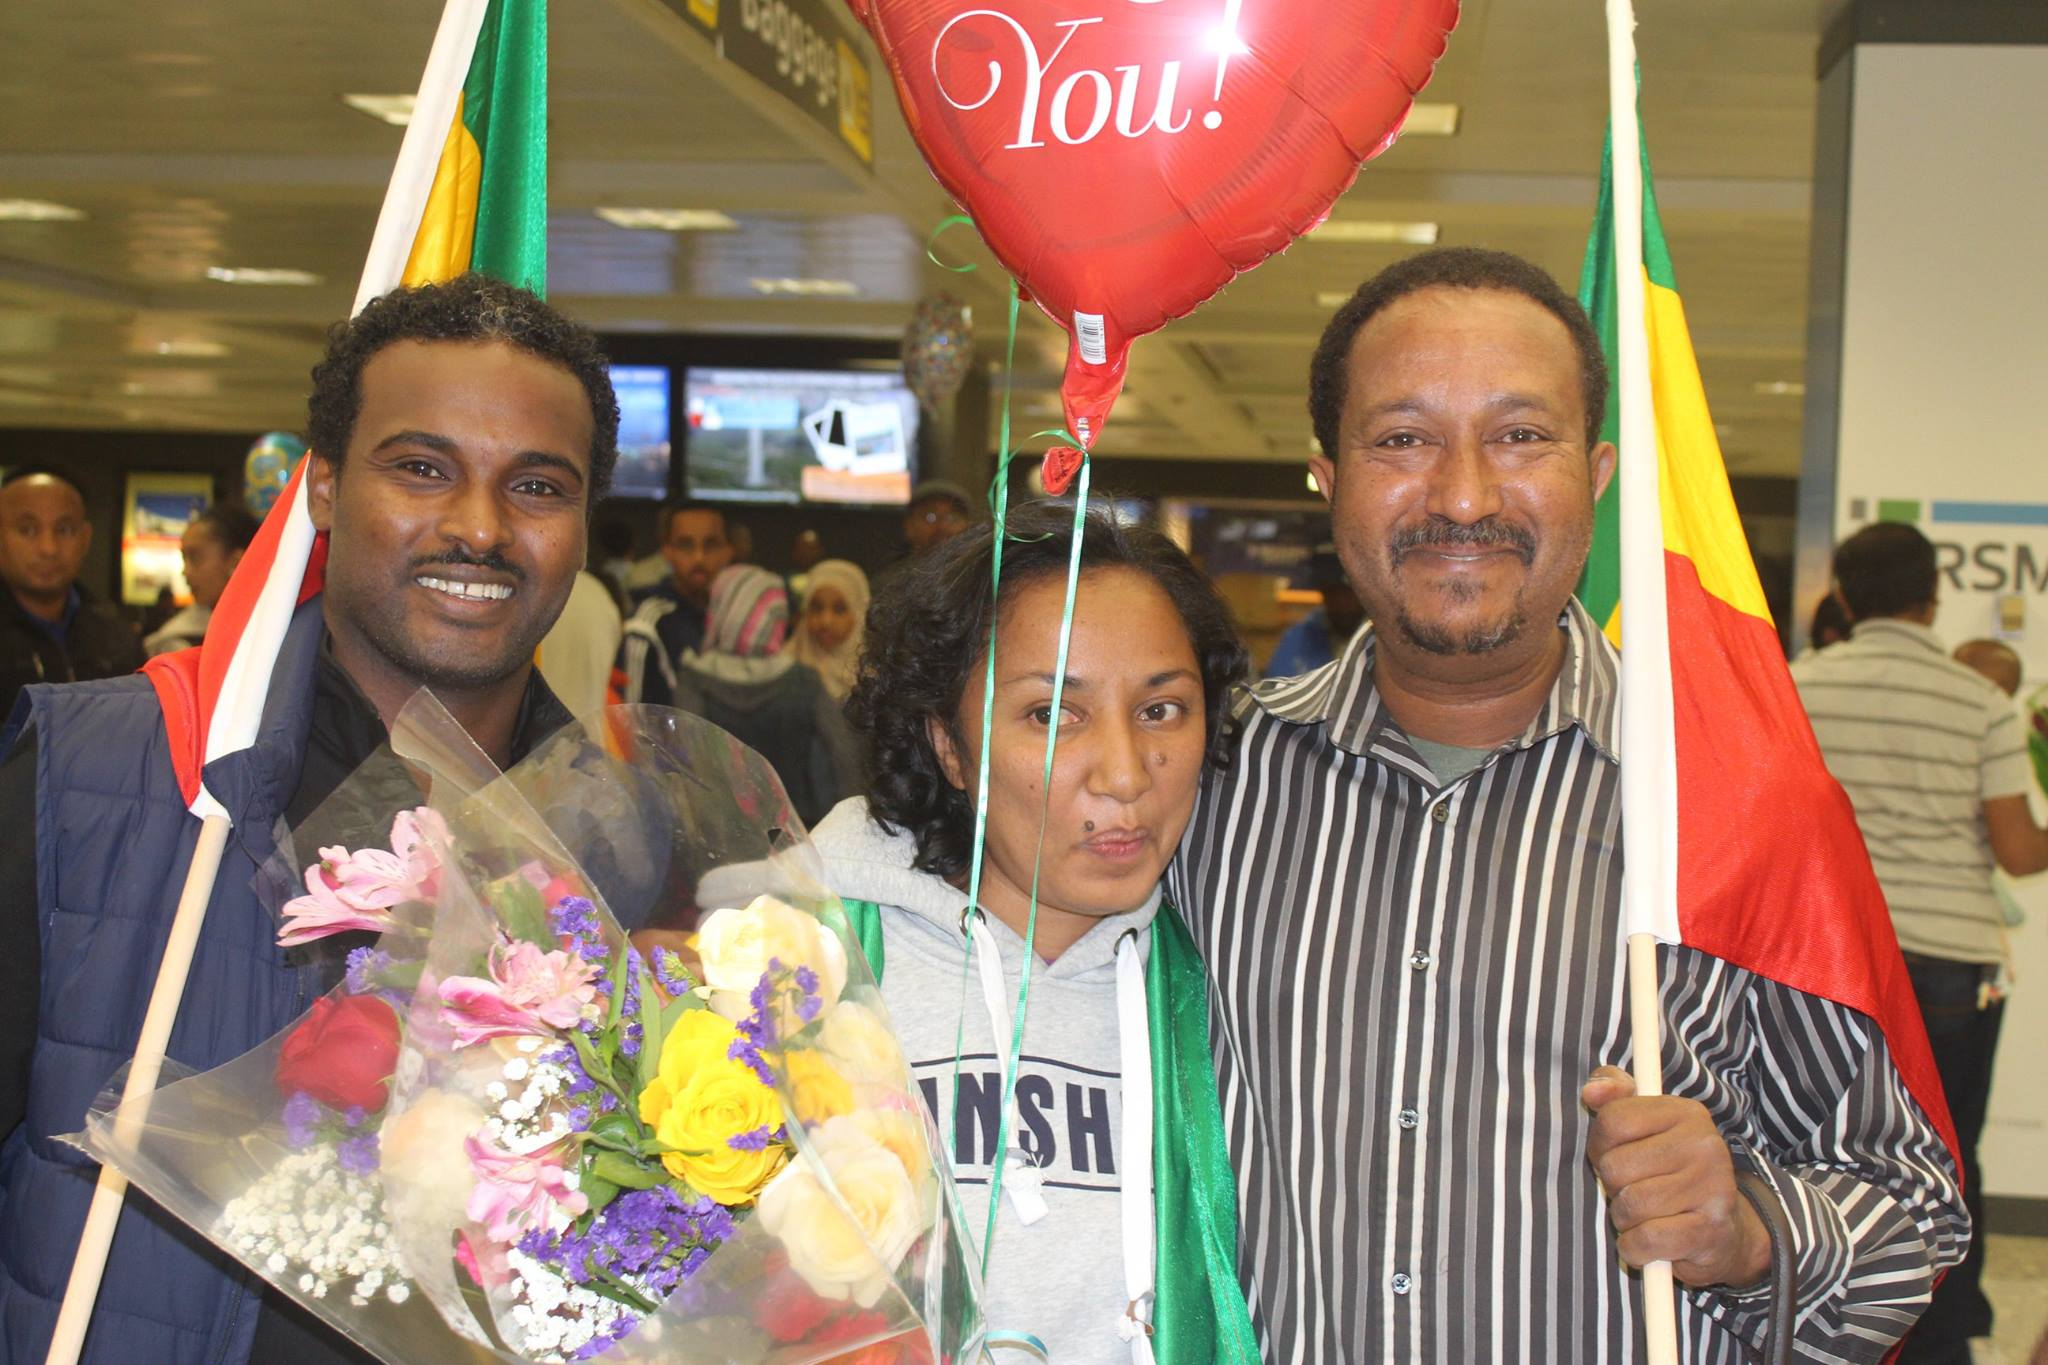 Reyot Alemu has arrived in Washington DC